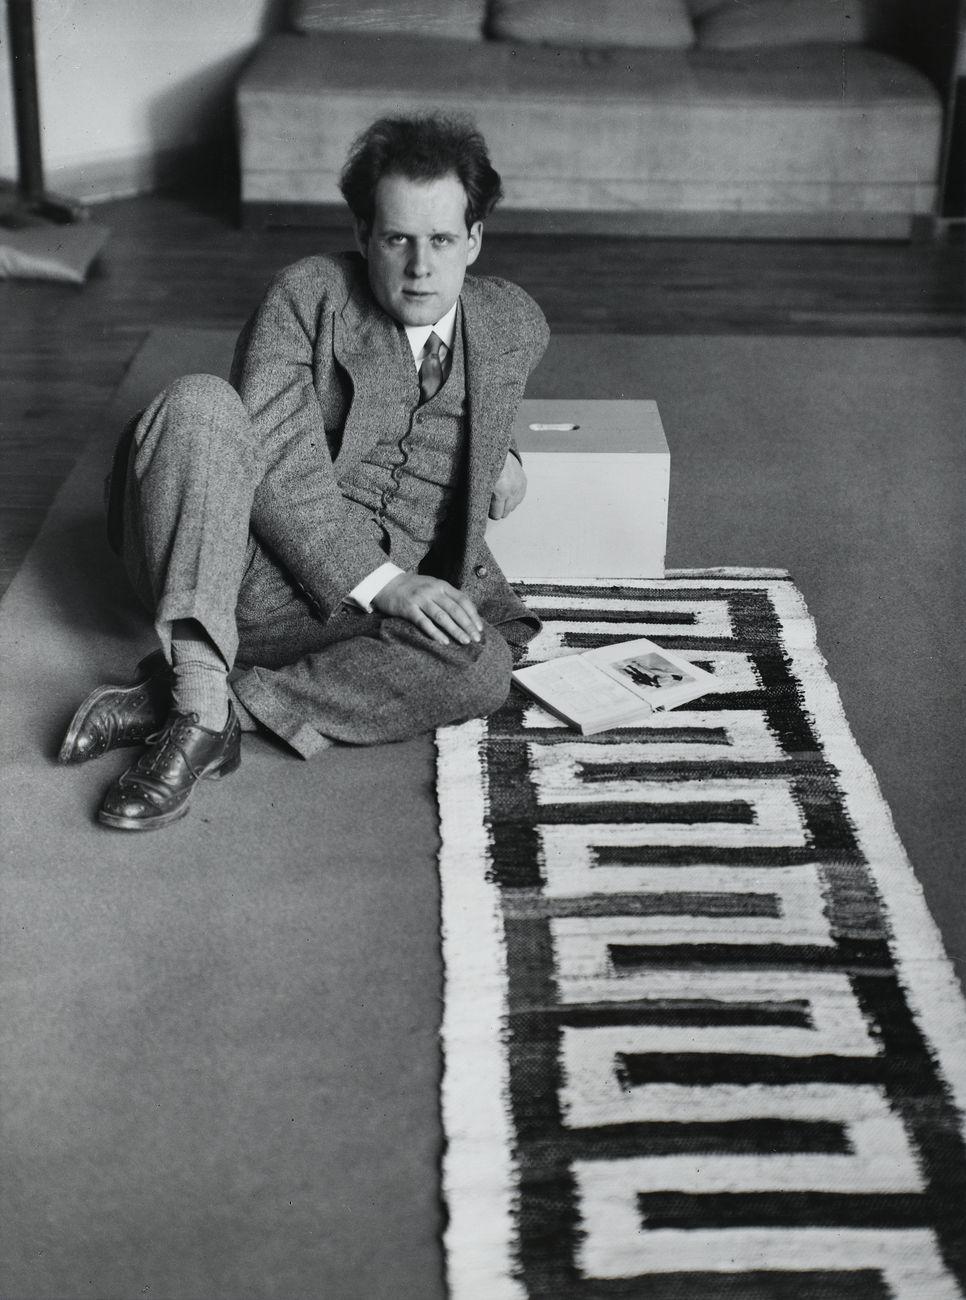 André Kertész, Sergei Eisenstein, 1928